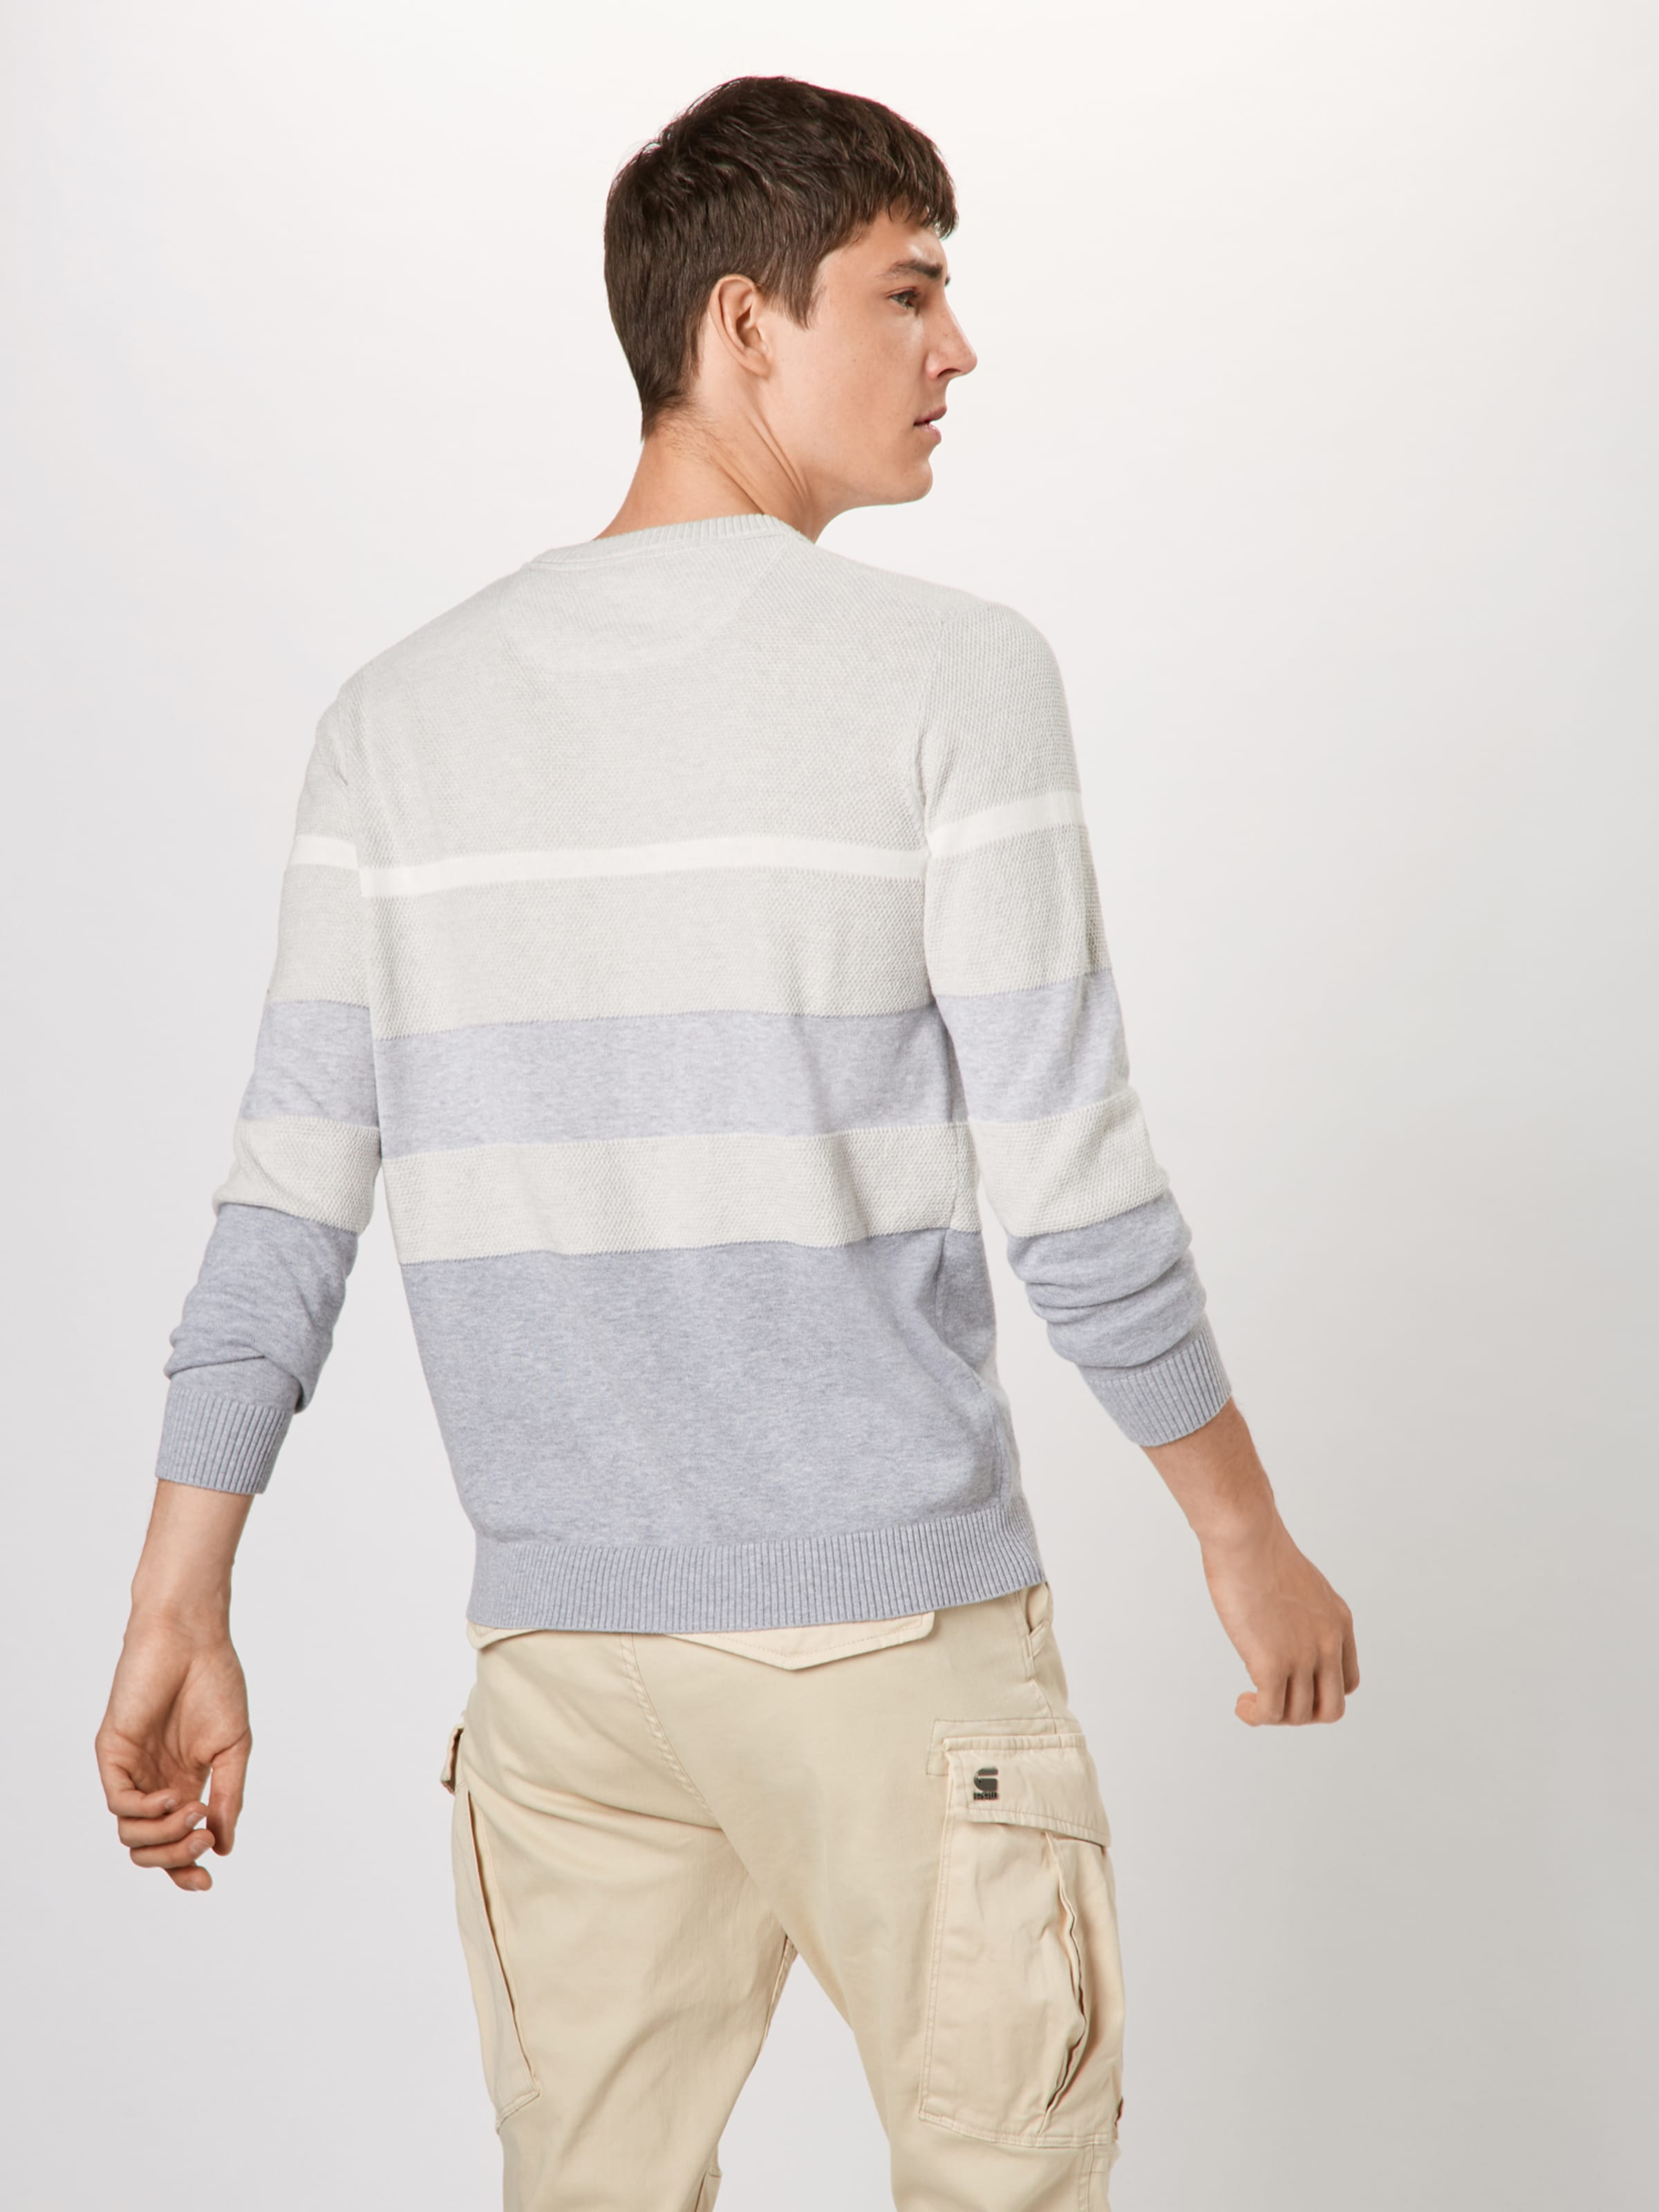 'core G star In Stripe' Raw RauchblauHellgrau Weiß Pullover vmnw8NO0